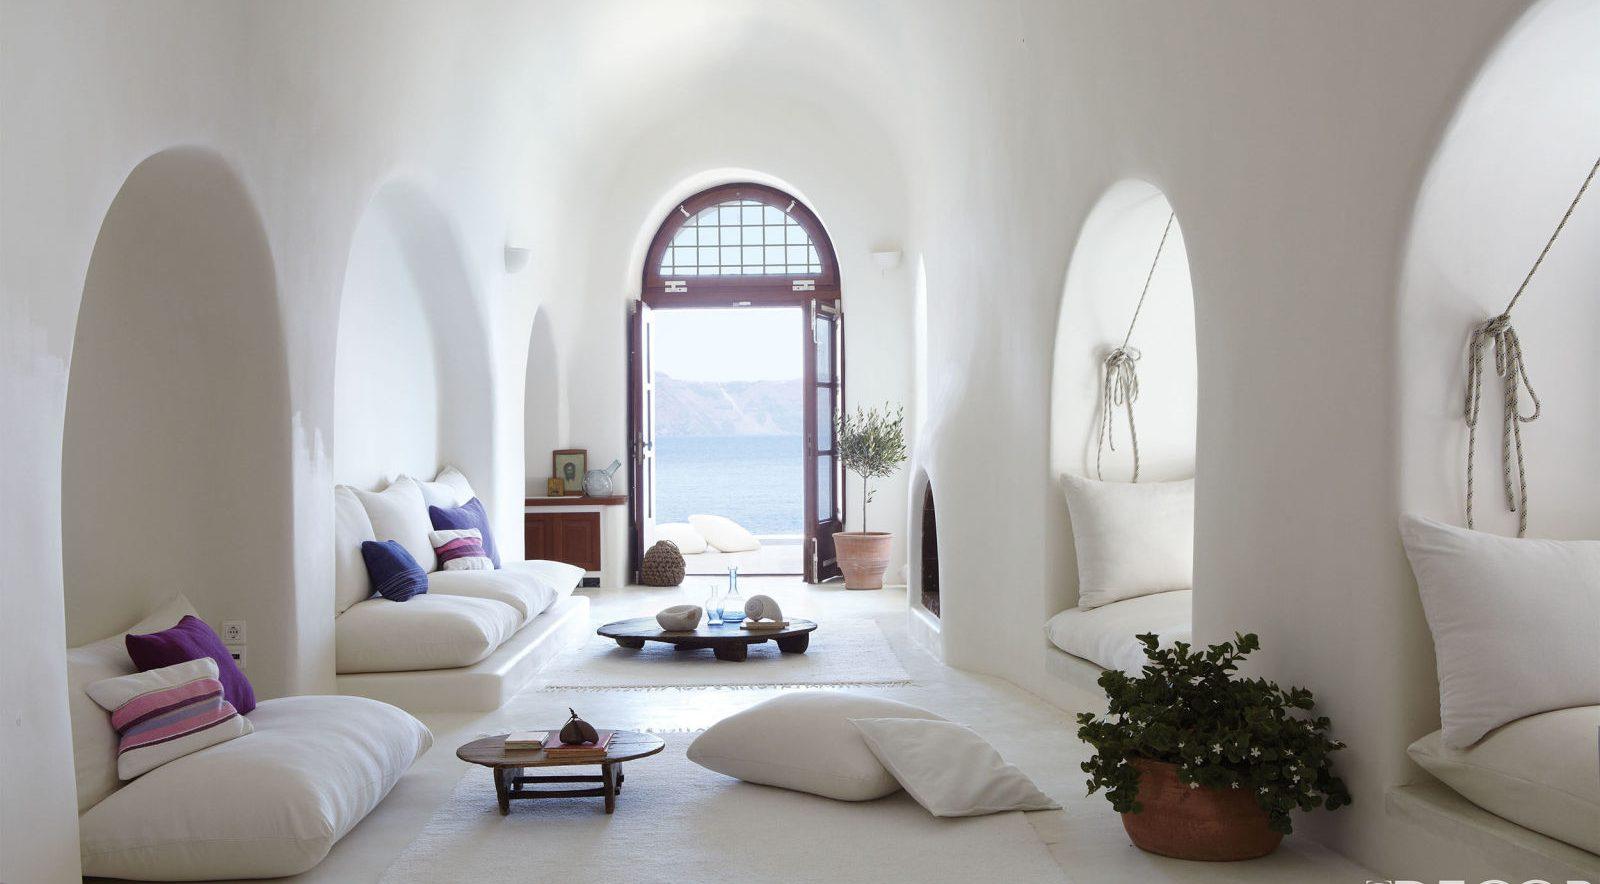 summer house Inspiring Summer House Decor Ideas gallery 1460586206 summerhouses image14 e1467896582267